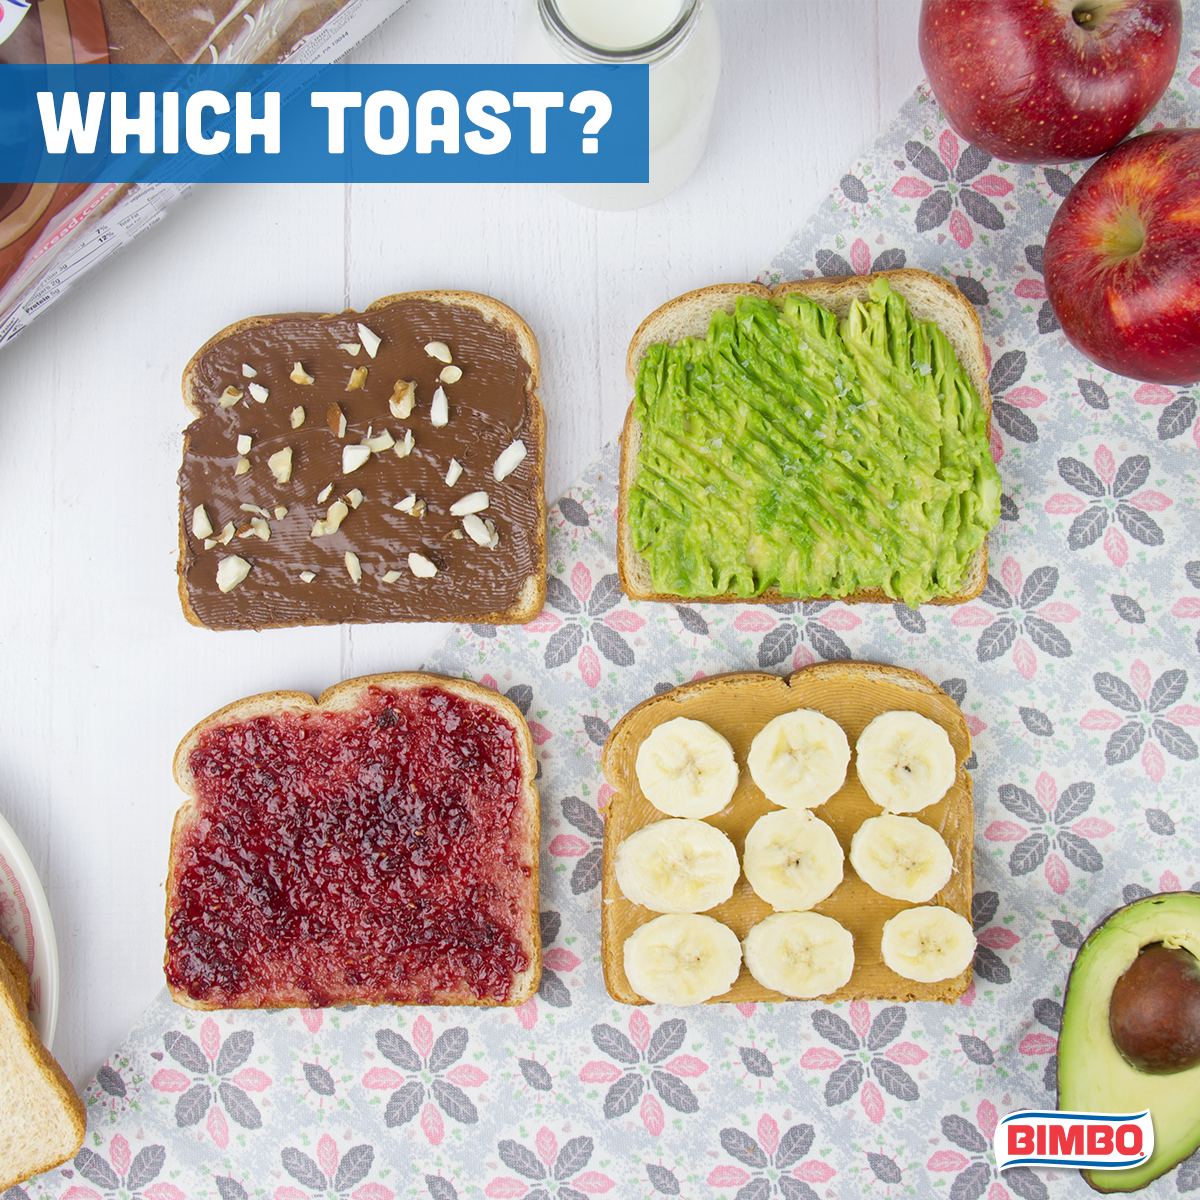 Bimbo_JULY_Which_Toast_Sq.jpg